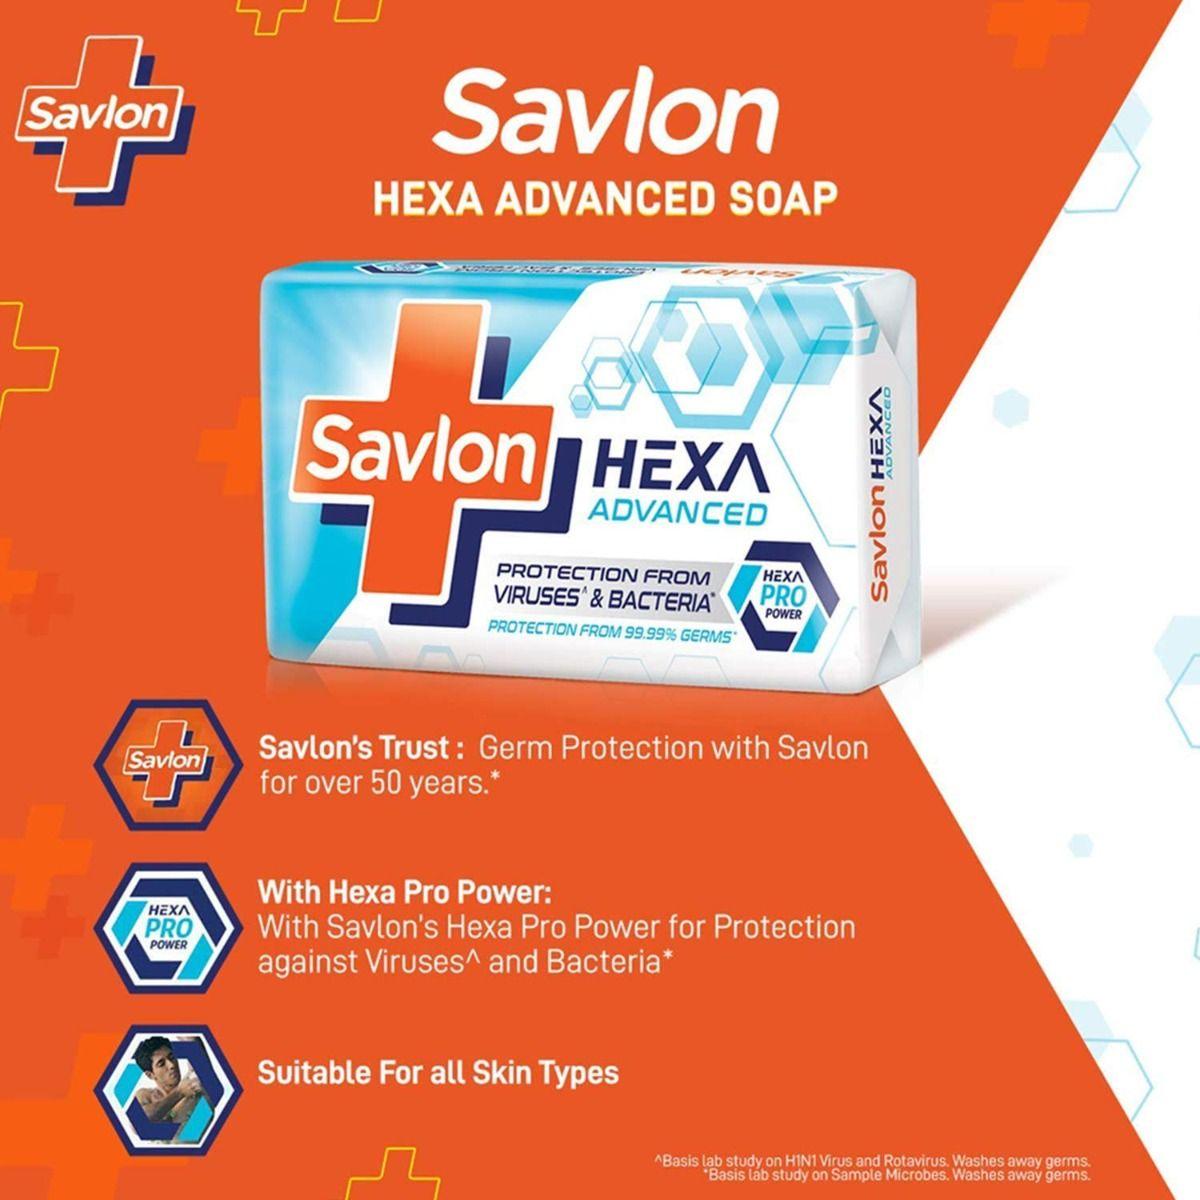 Savlon Hexa Advanced Soap, 75 gm, Pack of 1